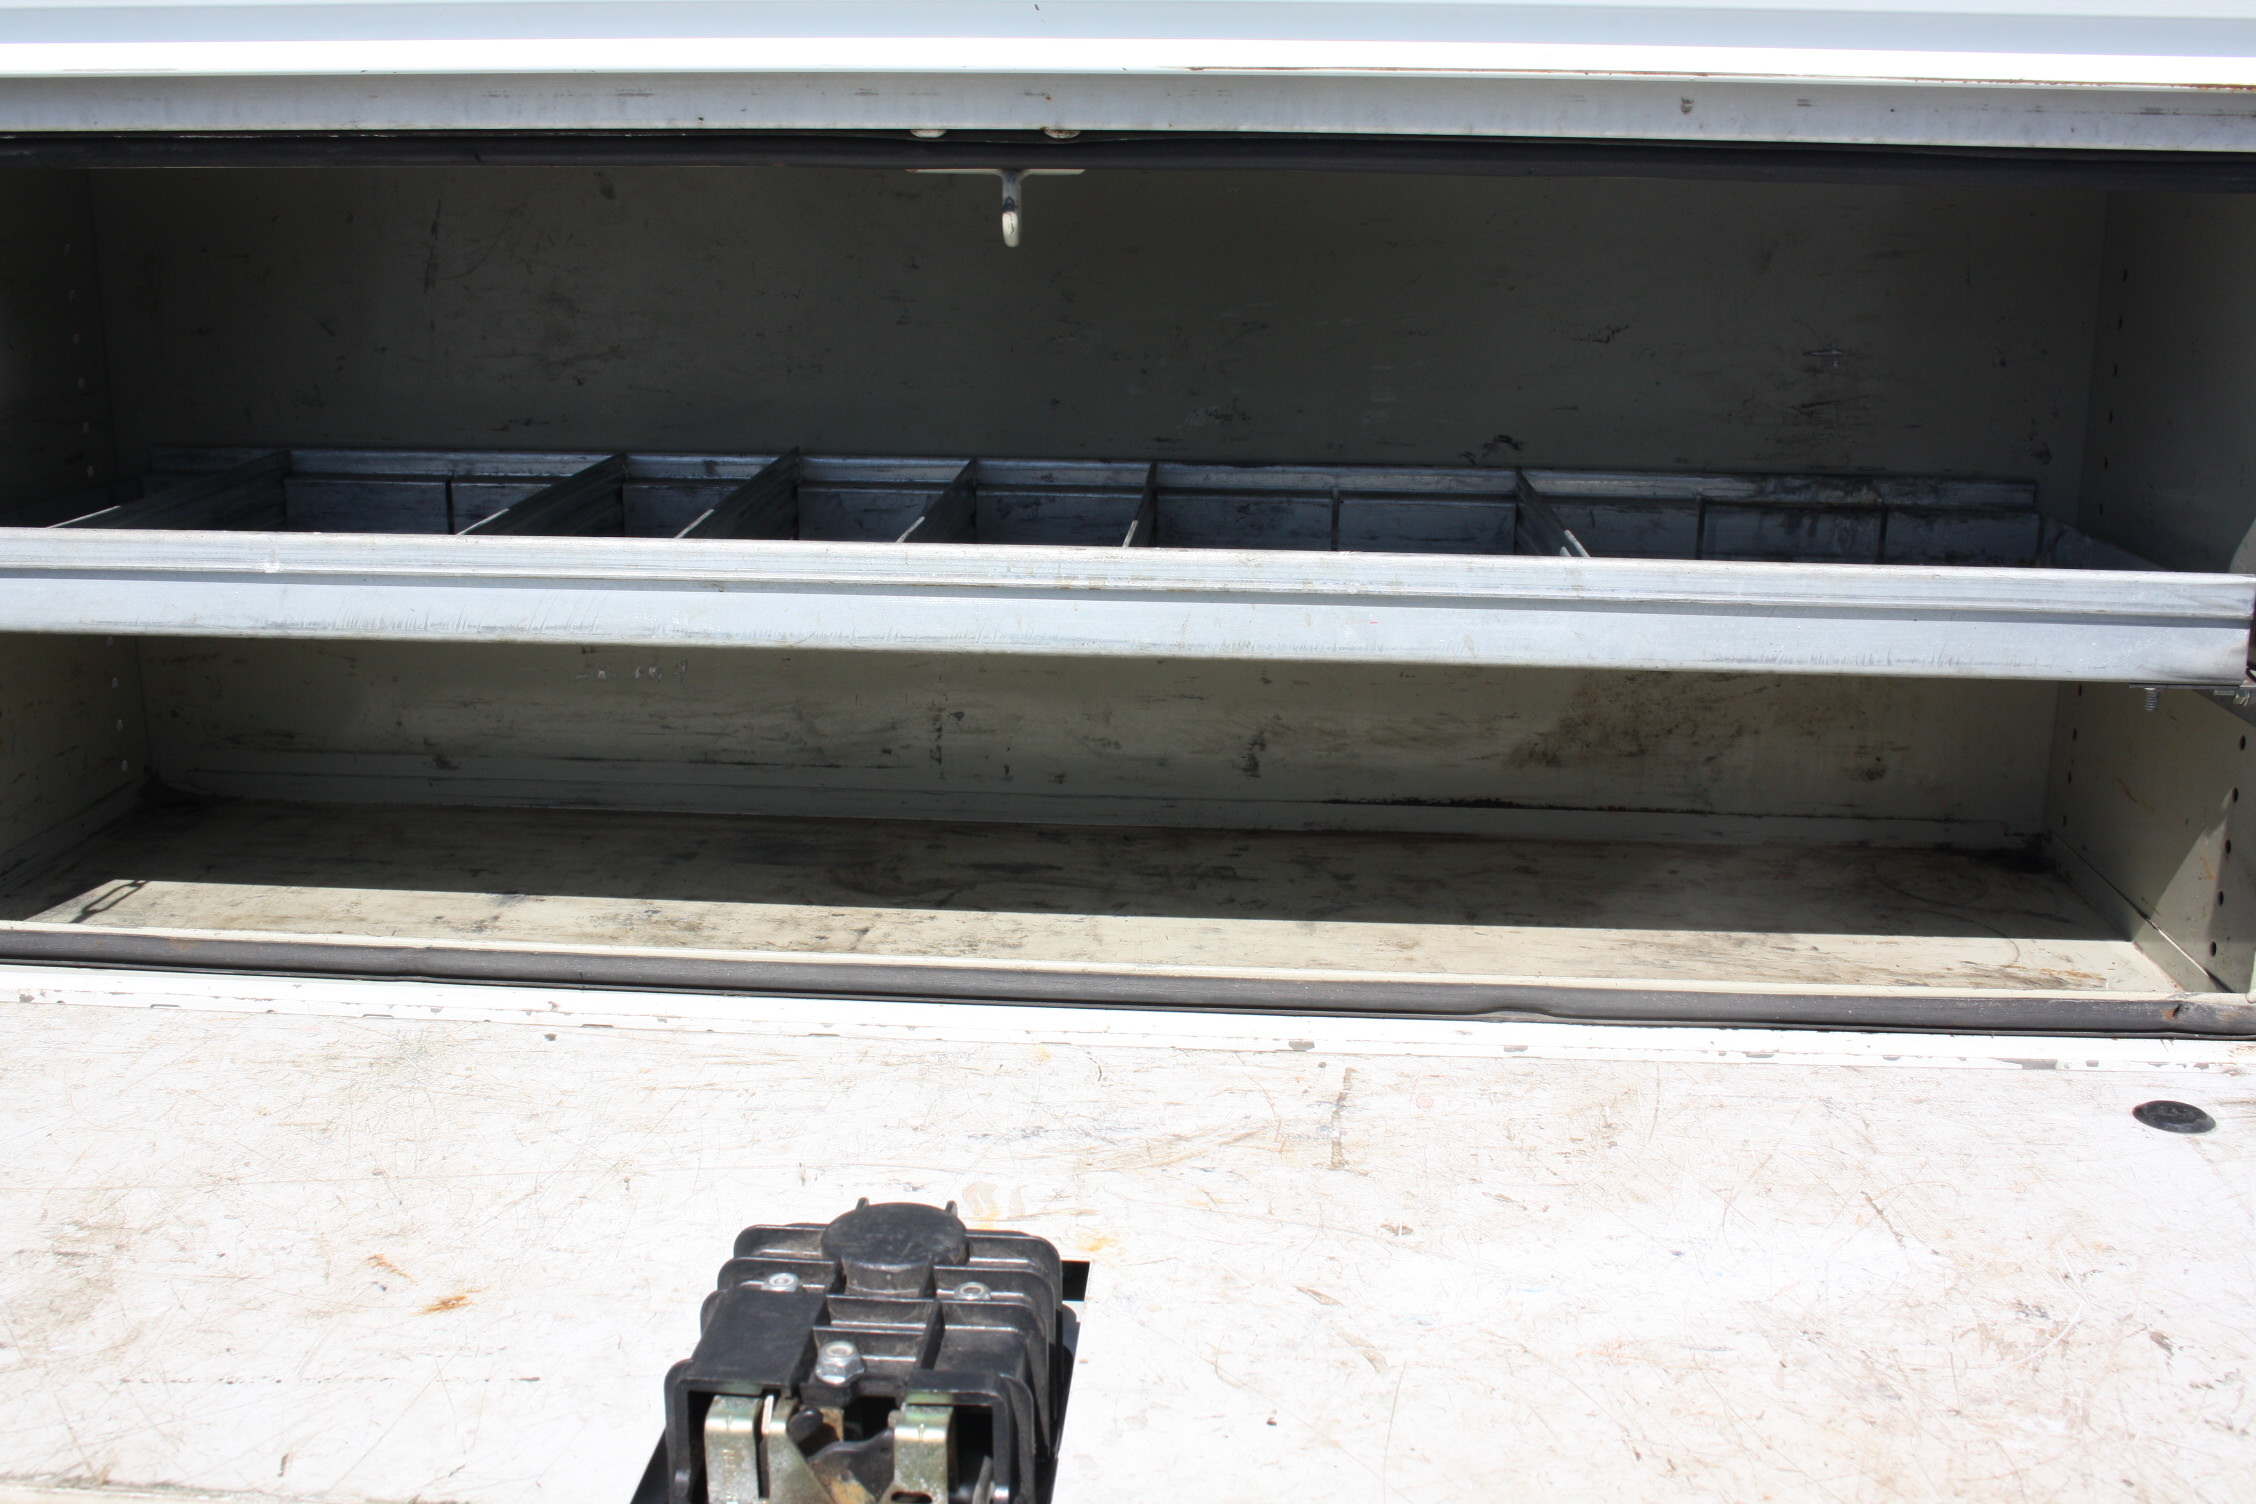 IMG 3006 - 2010 DODGE RAM 2500HD KNAPHEIDE UTILITY TRUCK